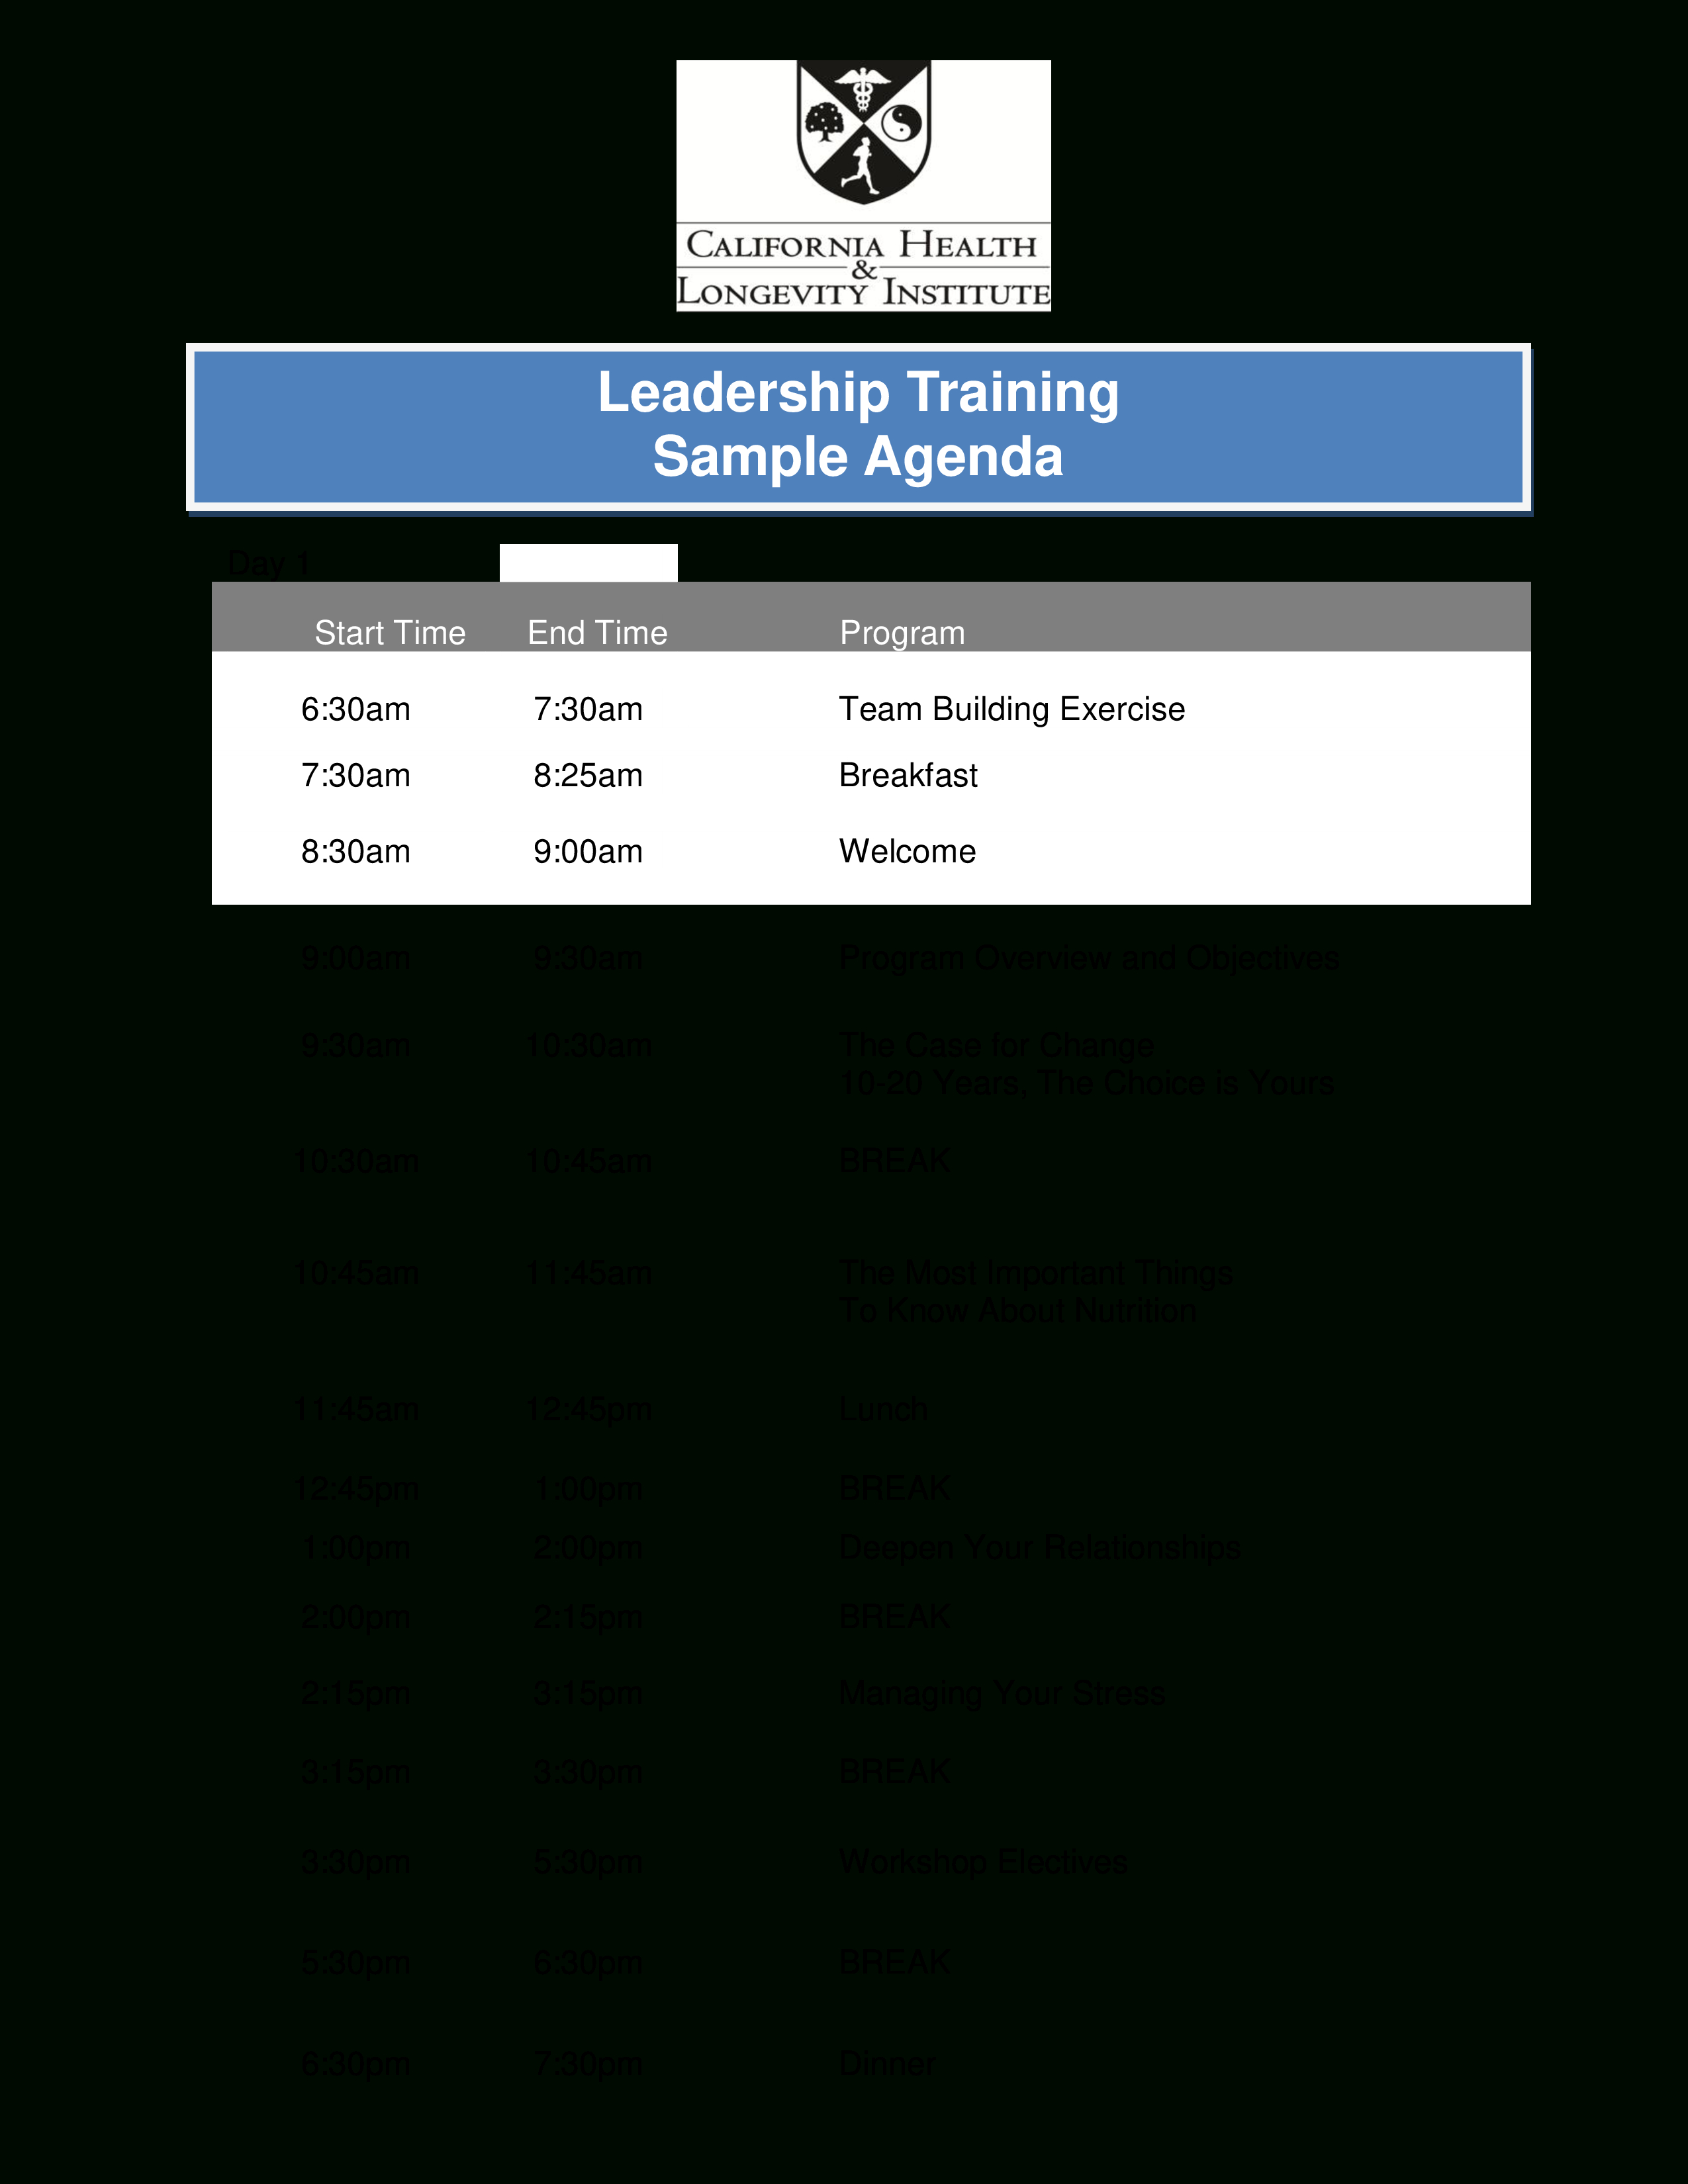 Leadership Training Agenda  Templates At Allbusinesstemplates Within Training Agenda Template